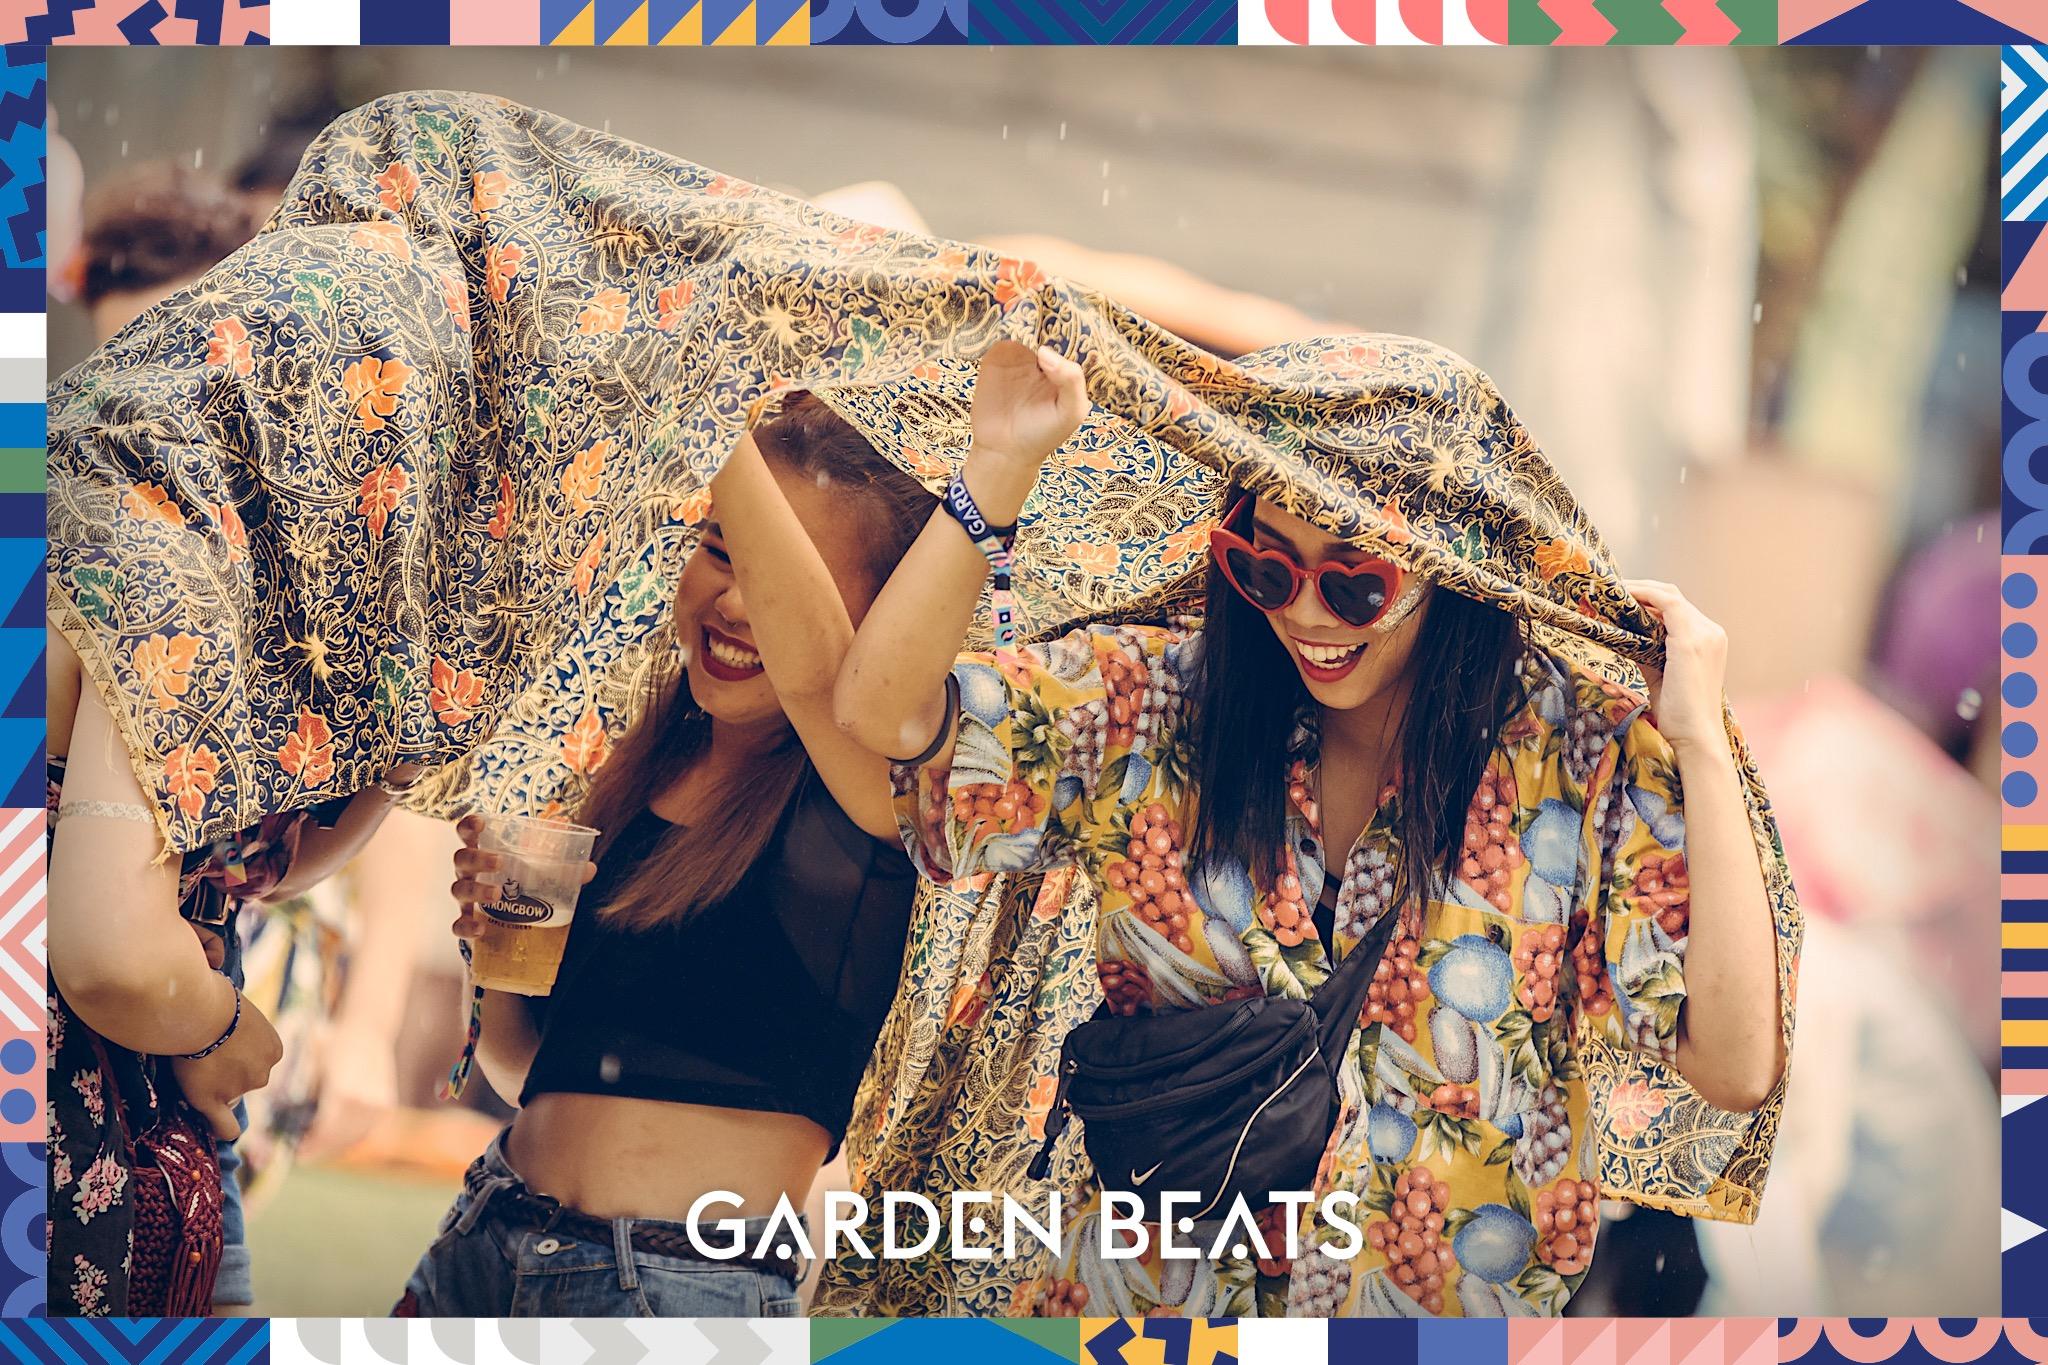 03032018_GardenBeats_Colossal529_Watermarked.jpg